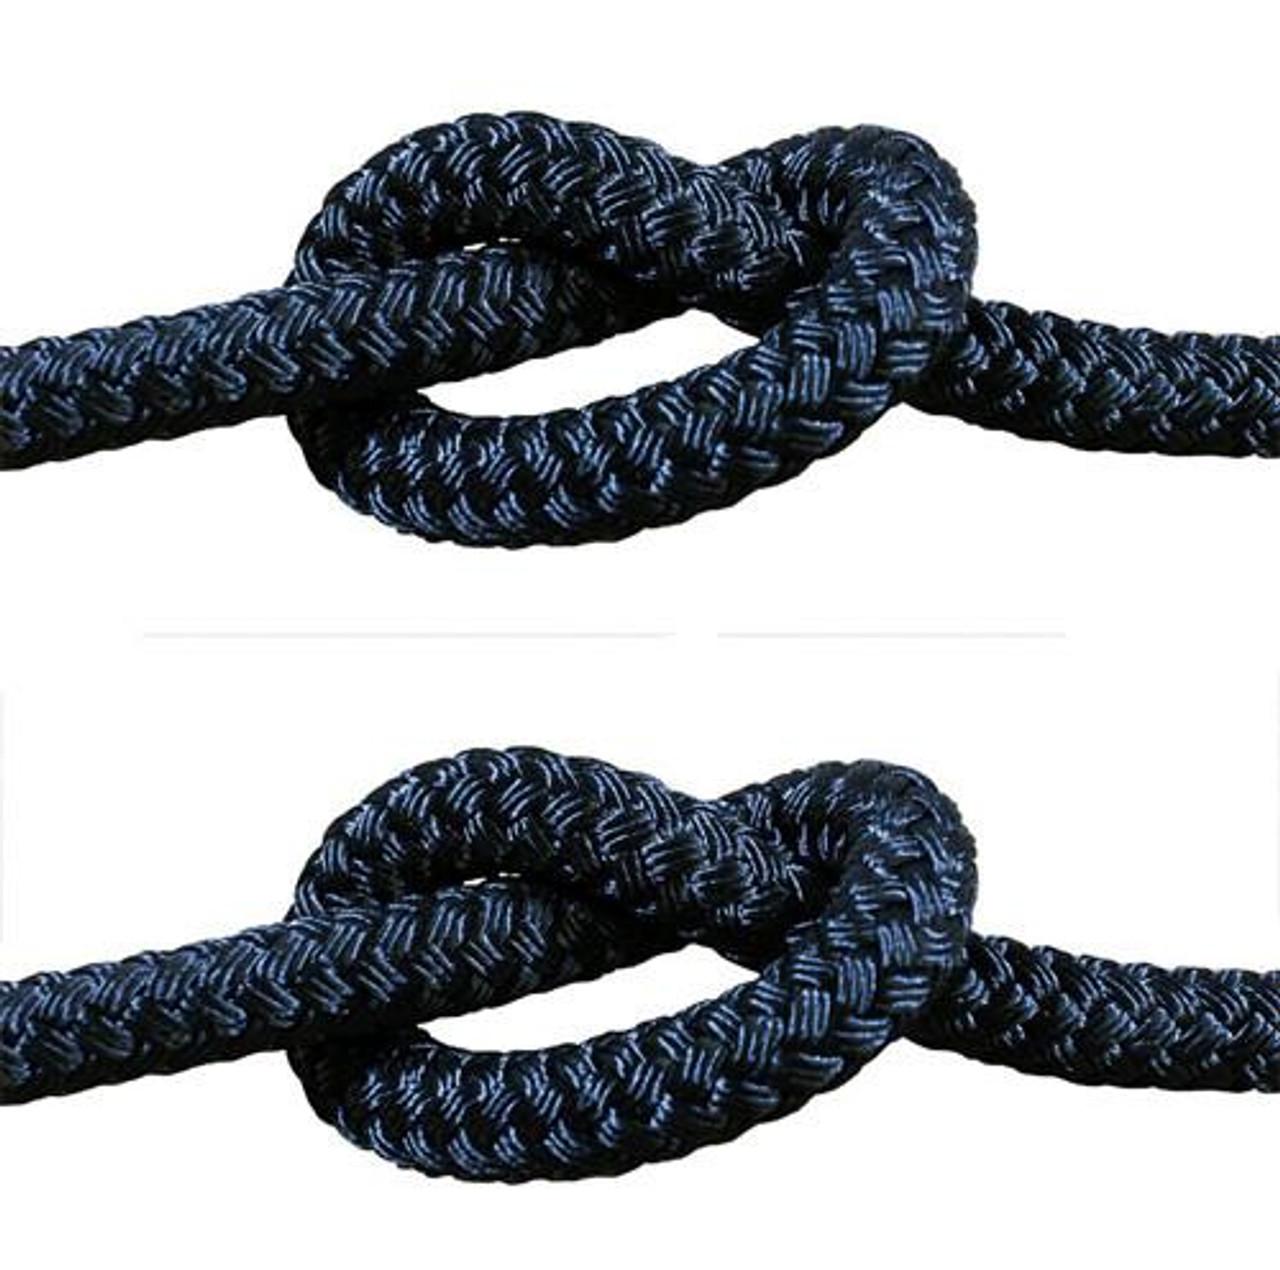 Rope - Double Braid Black 8mm x 1metre